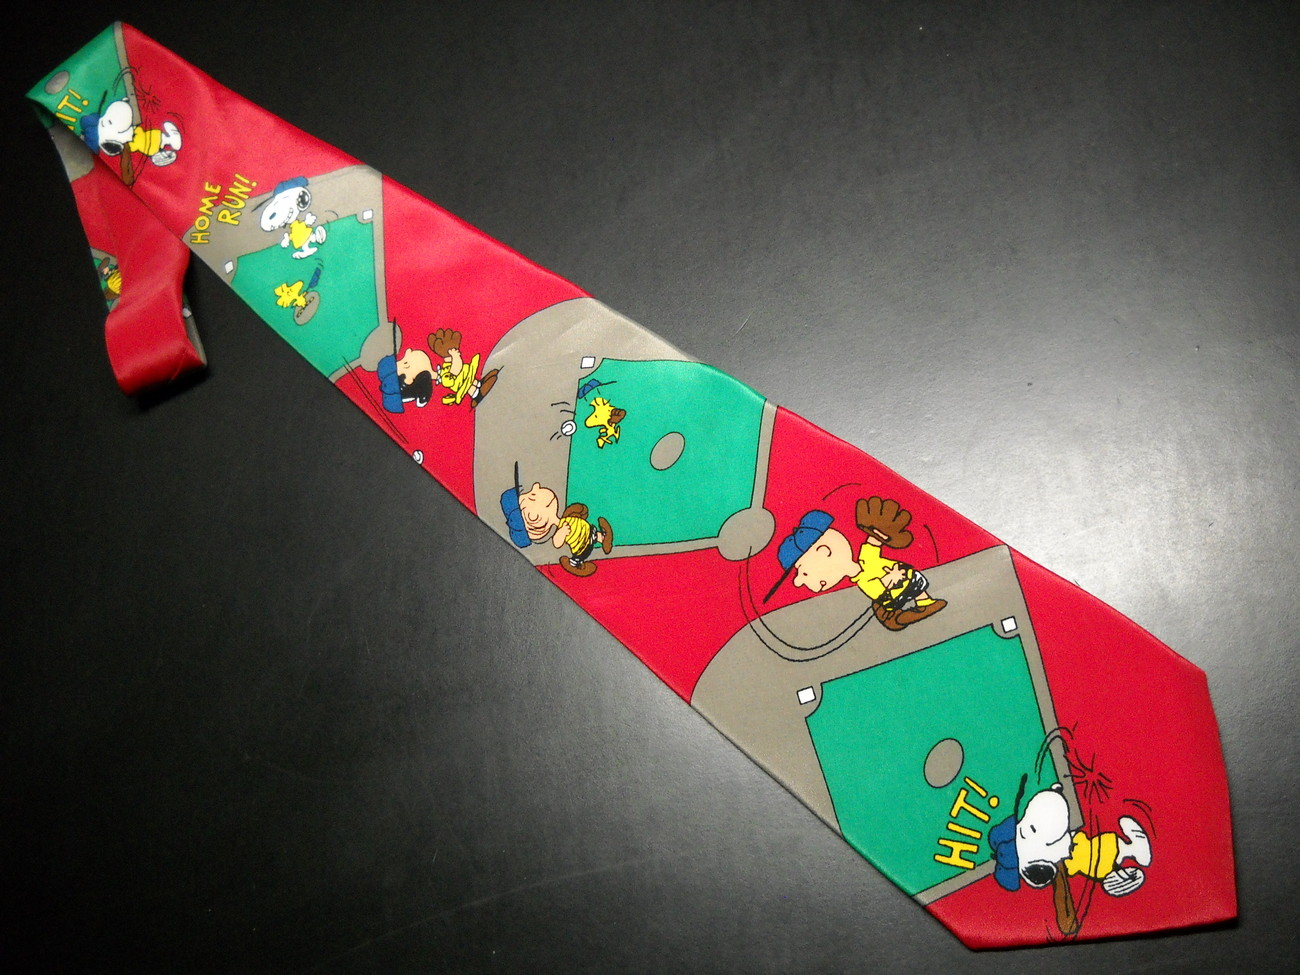 Peanuts Charlie Brown and Gang Neck Tie I Wanna Win Baseball Red Green Ballfield Charlie Brown and Friends Peanuts